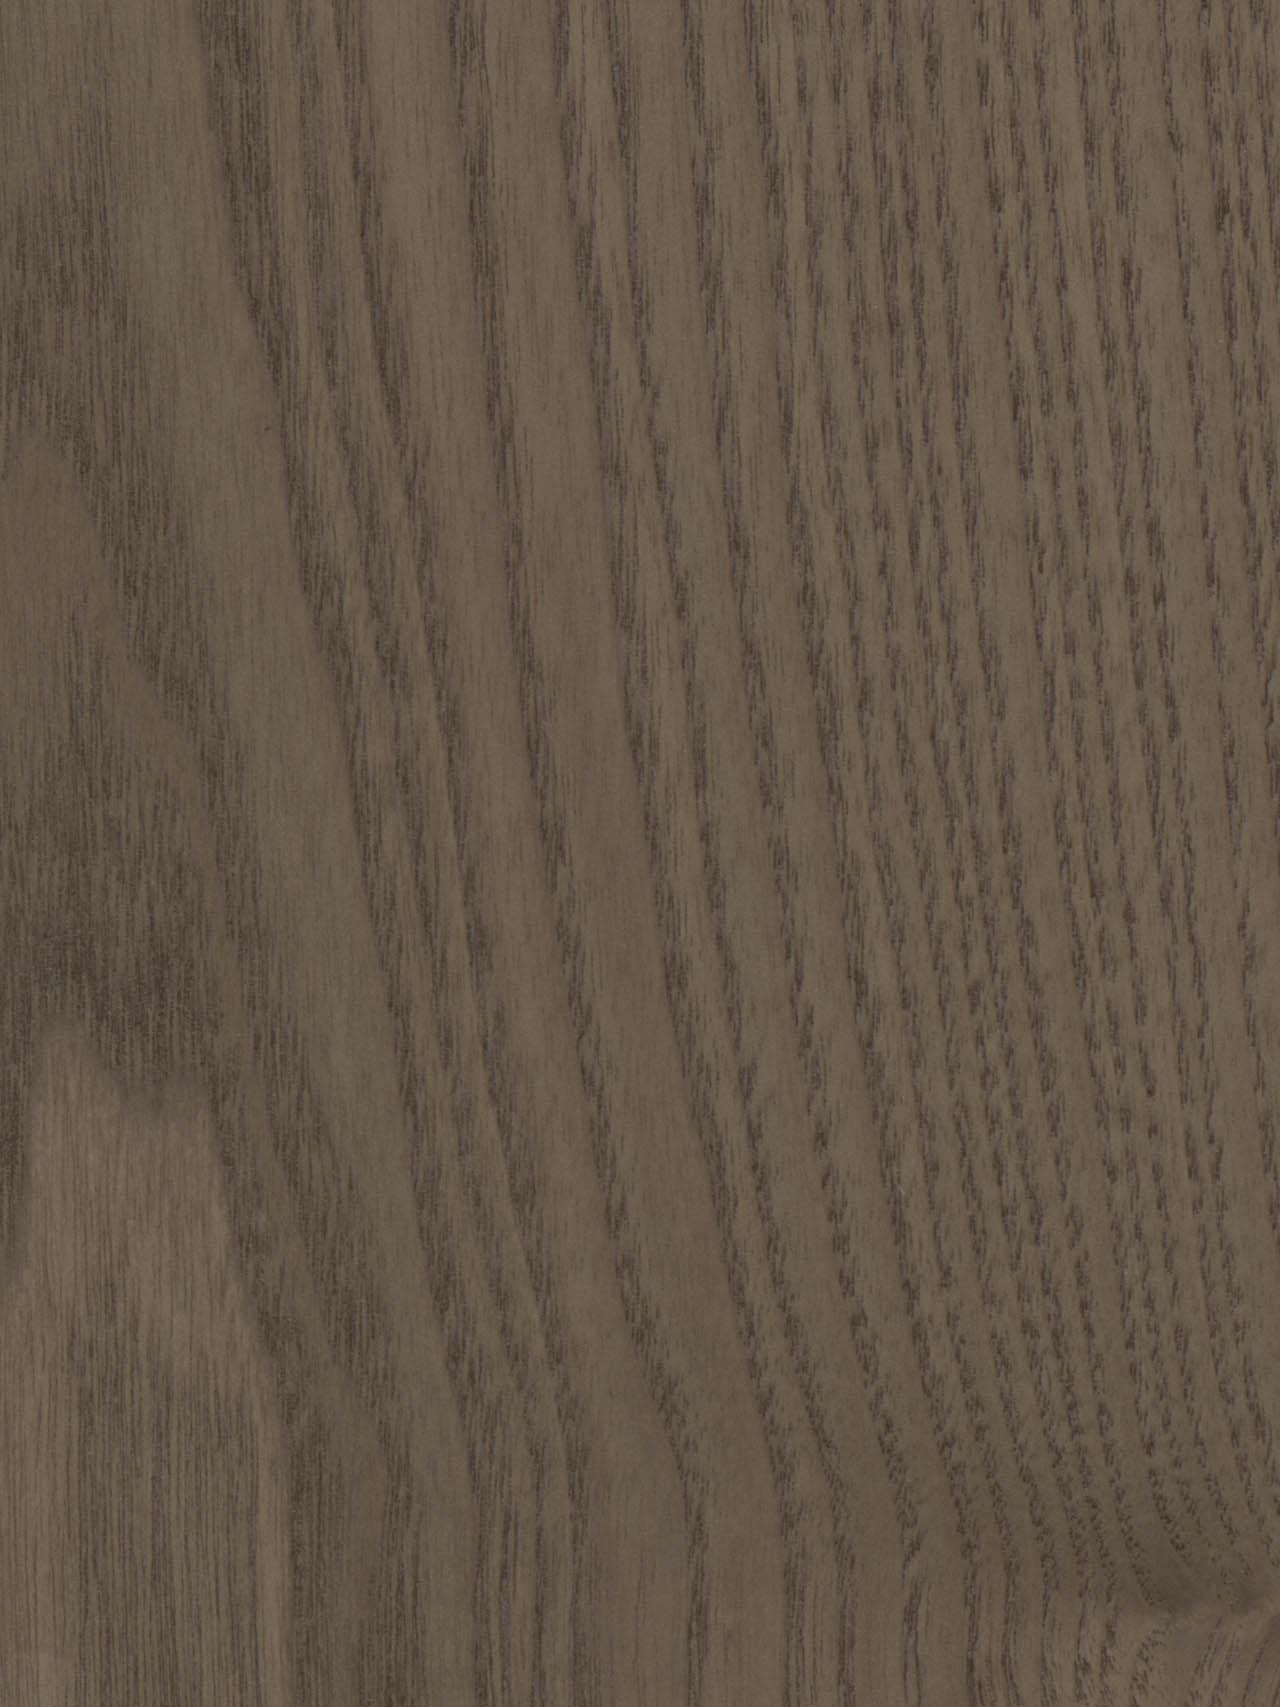 Chapa madera Fresno Avellana MBF128 Losán